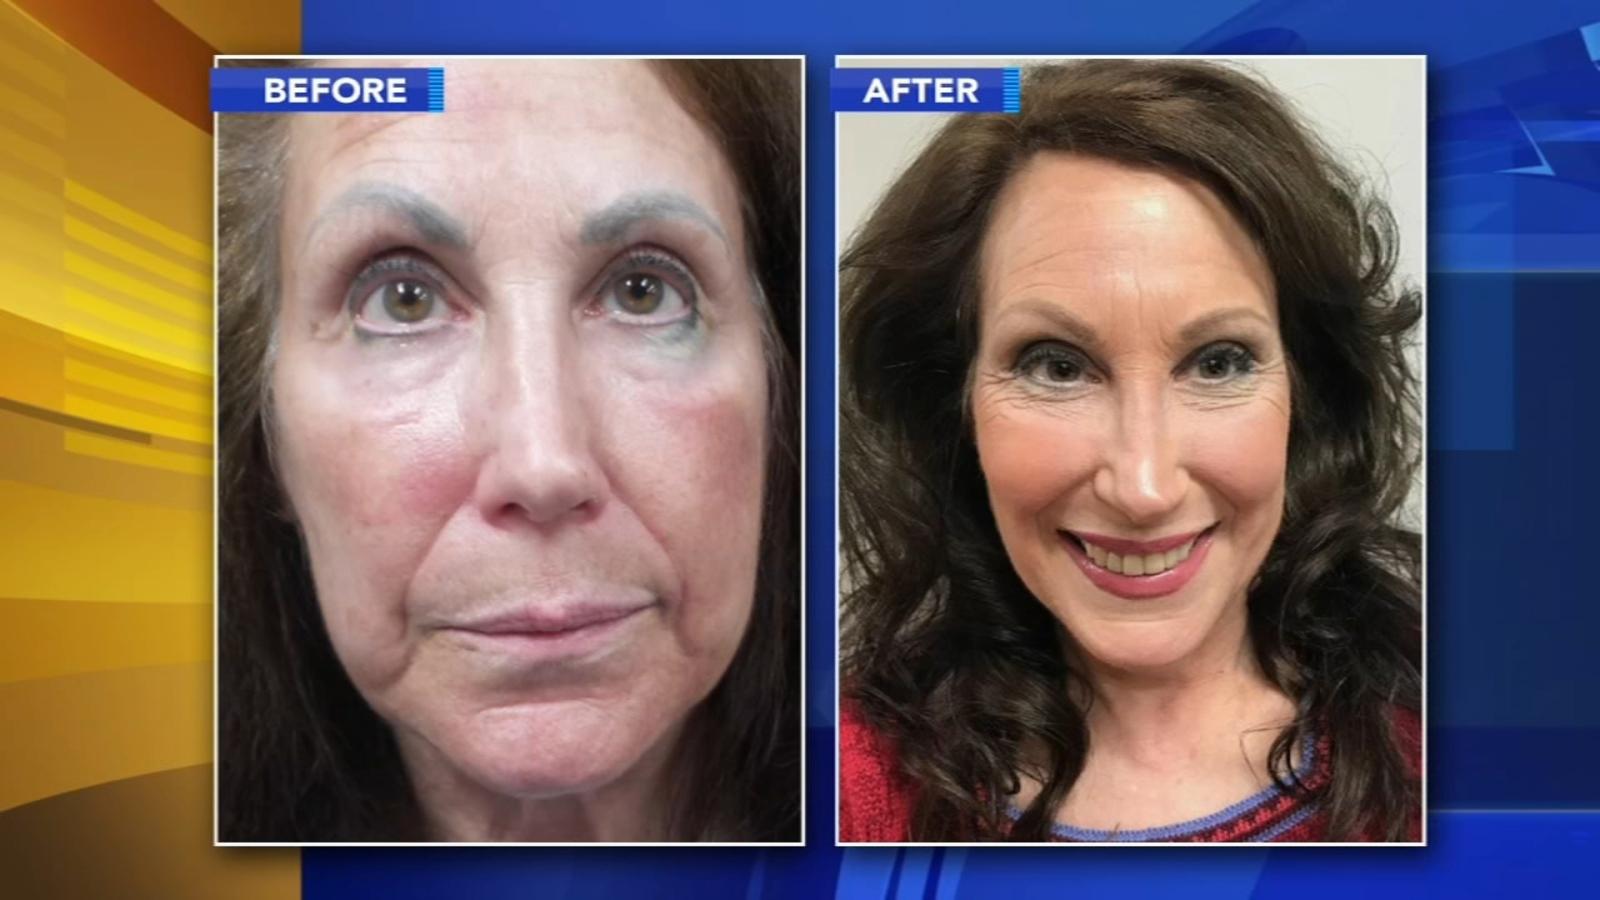 Fixing Permanent Makeup Disasters